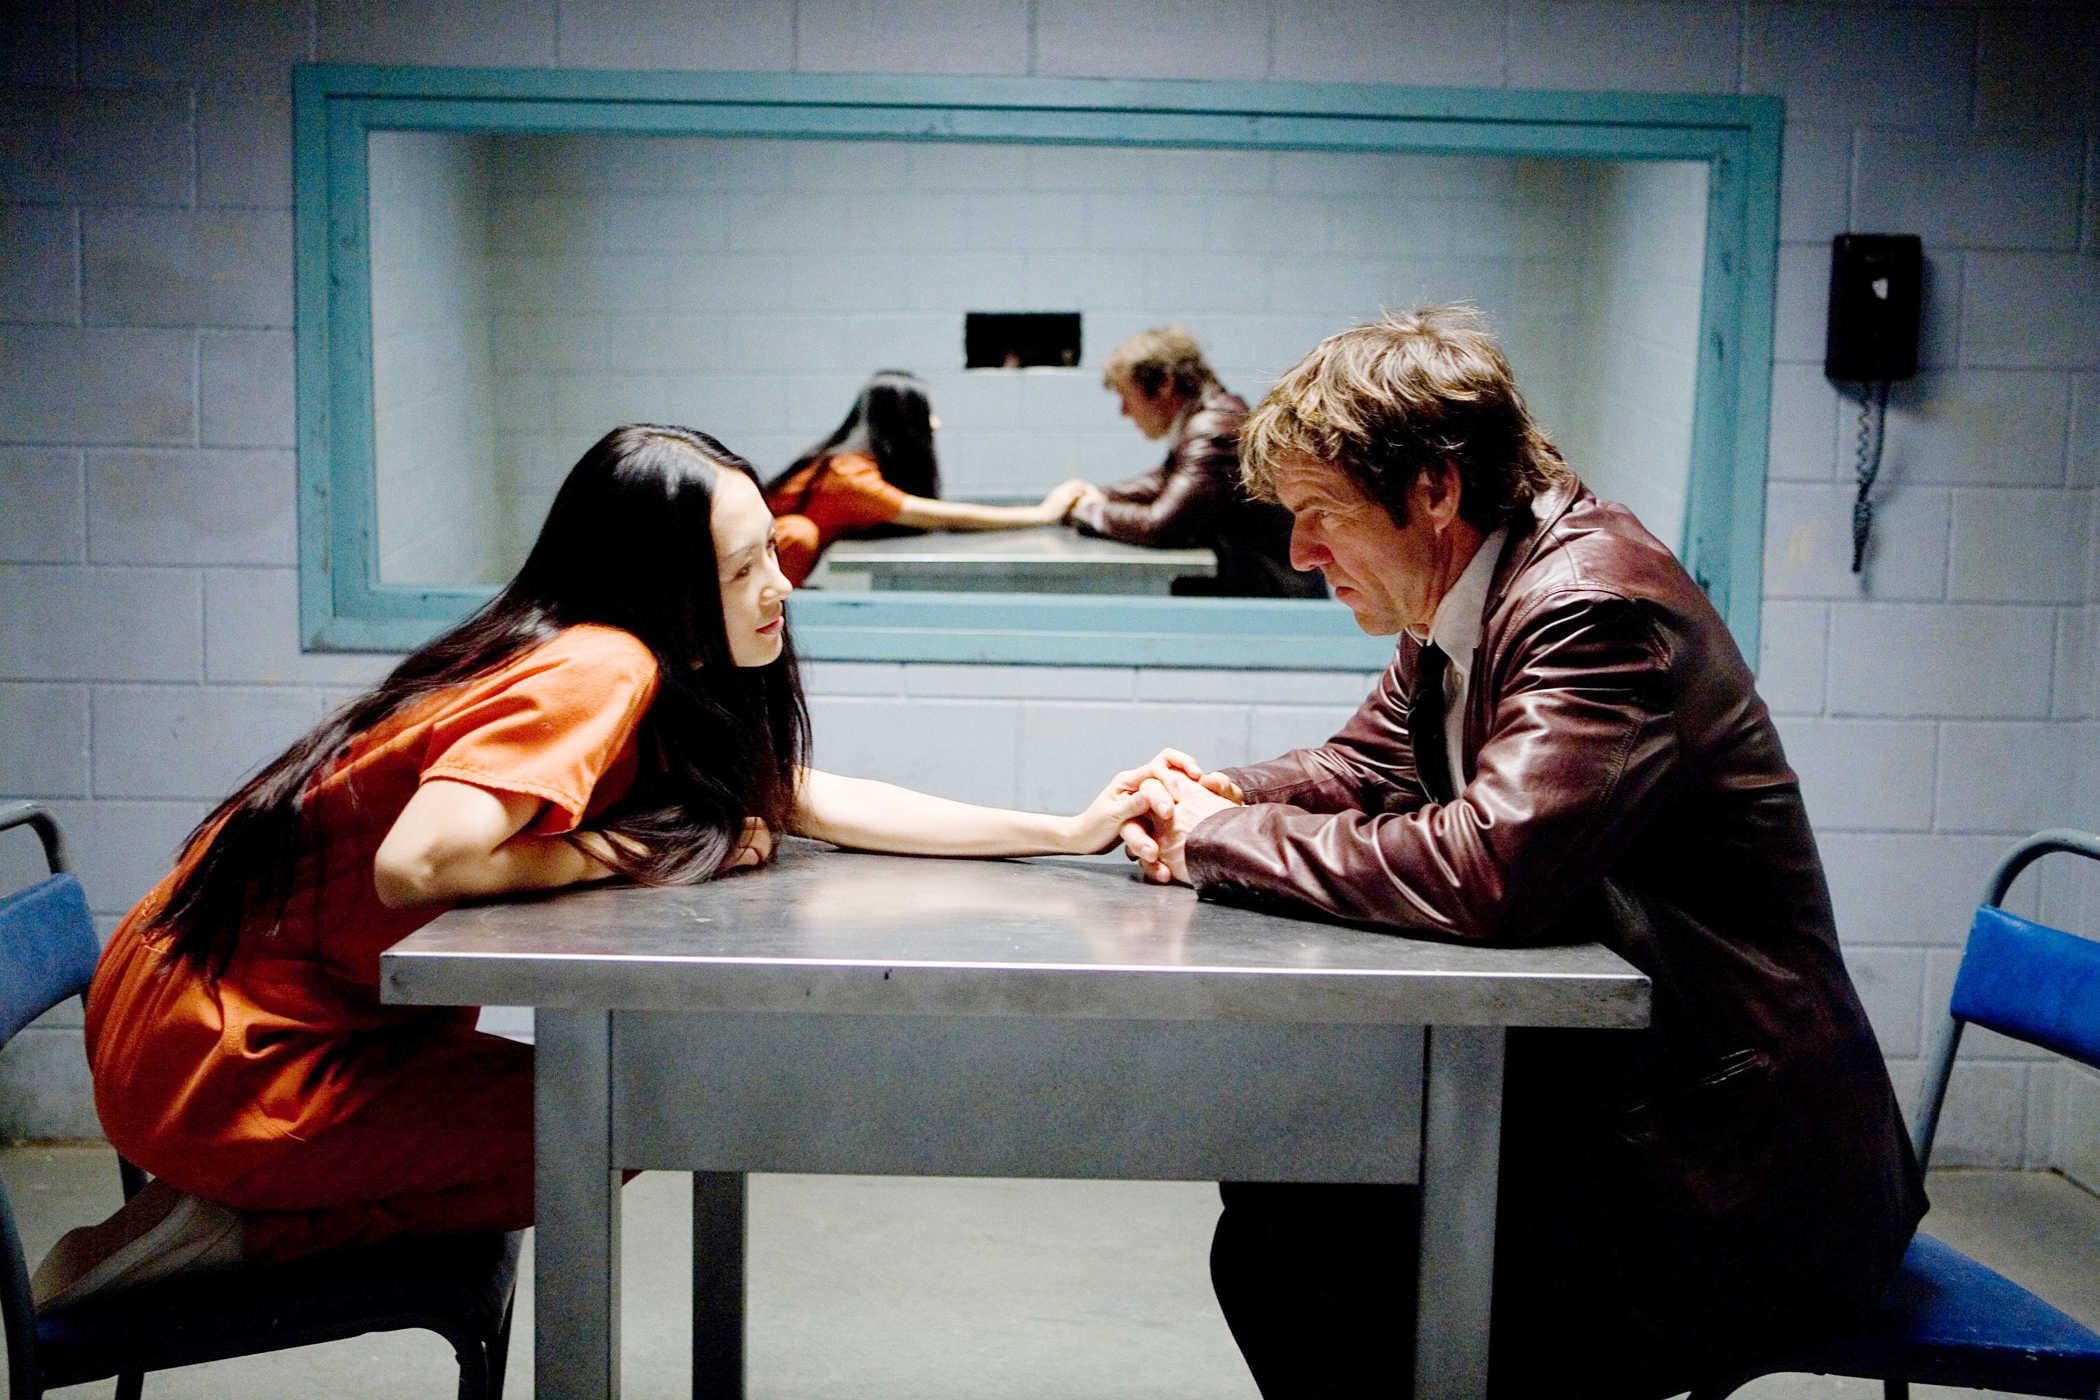 Dennis Quaid interrogates Zhang Ziyi in Horsemen (2009)